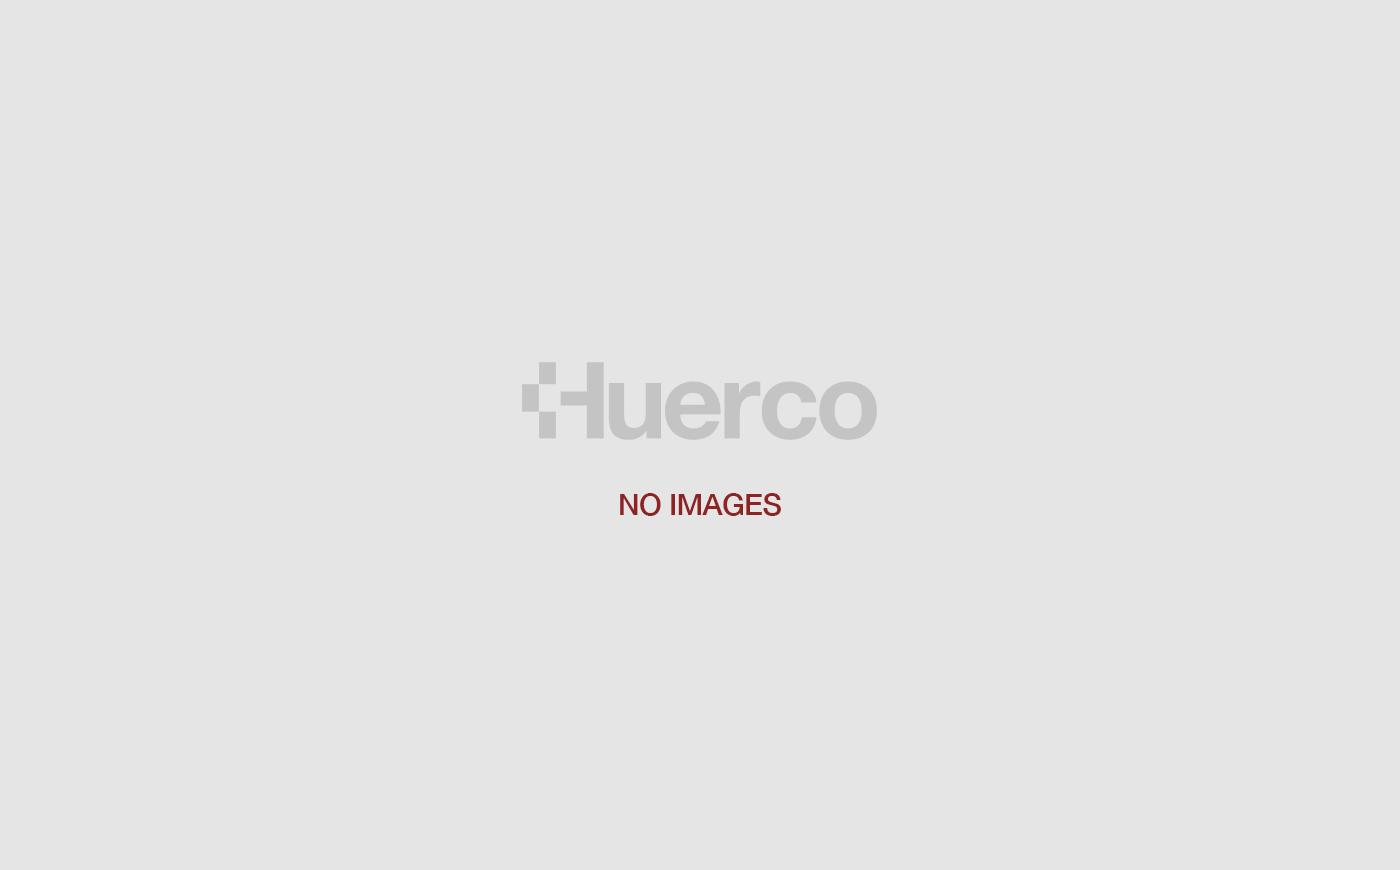 Huerco No Images